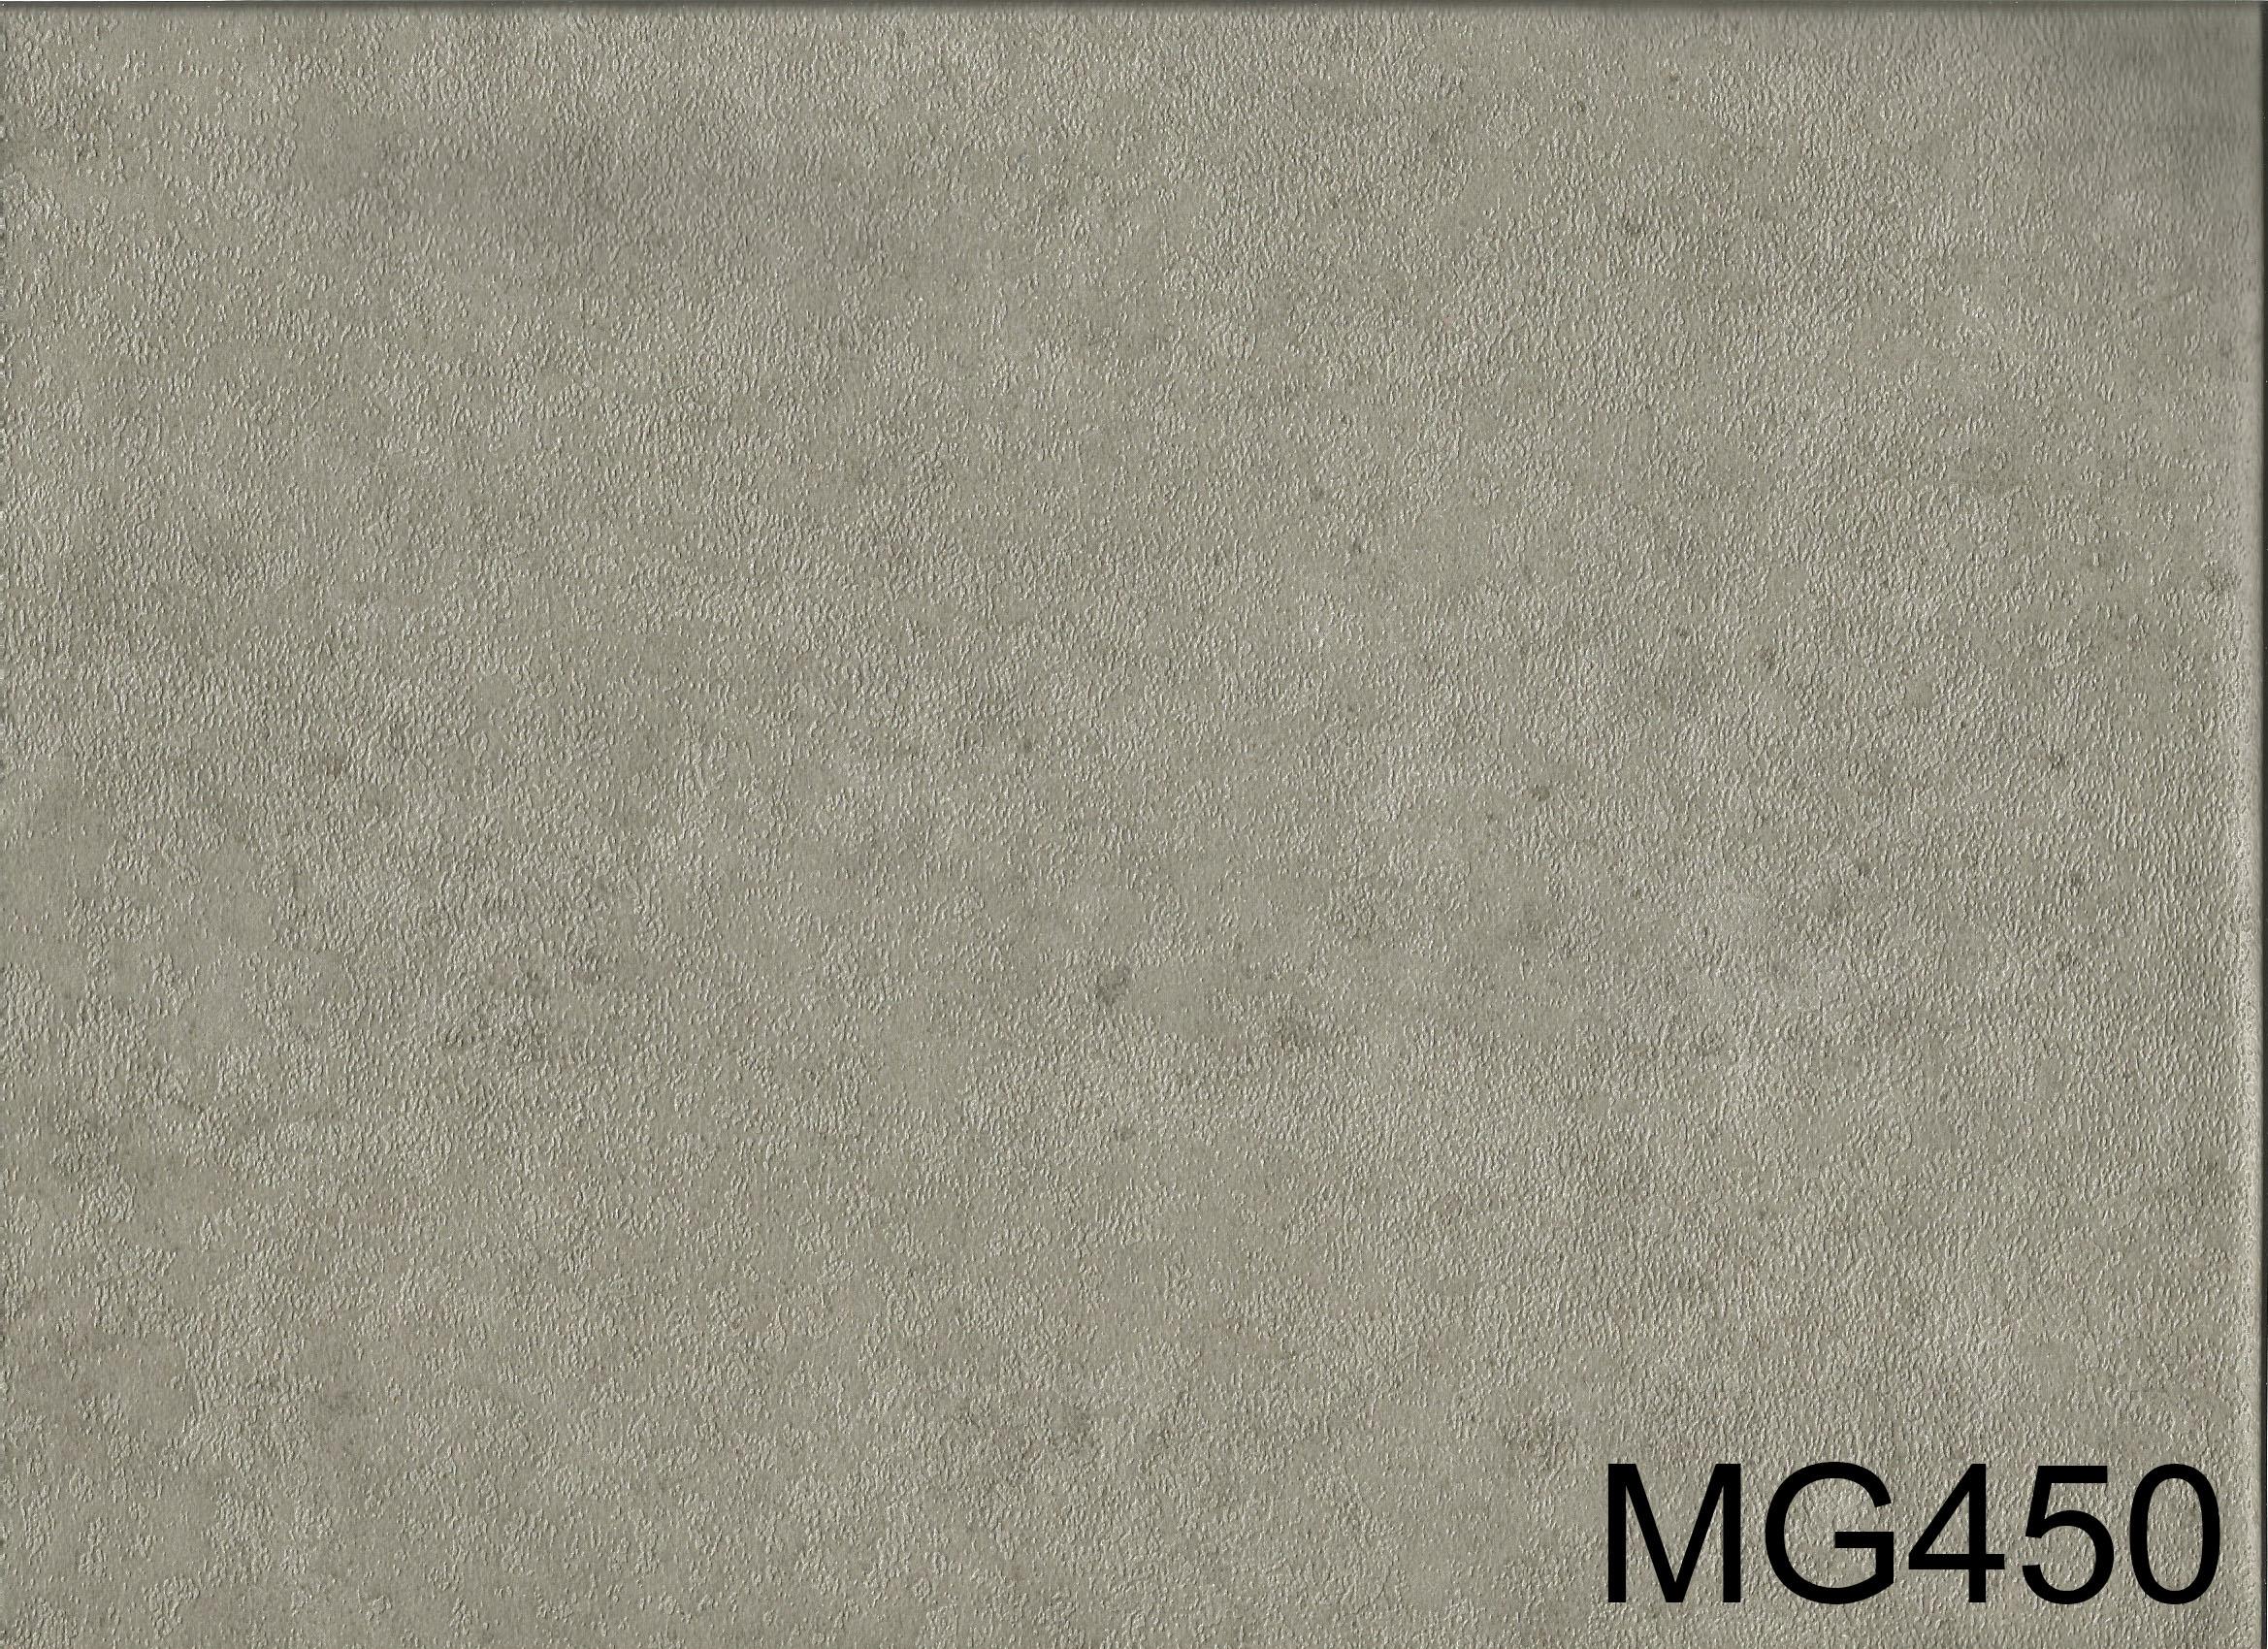 MG450